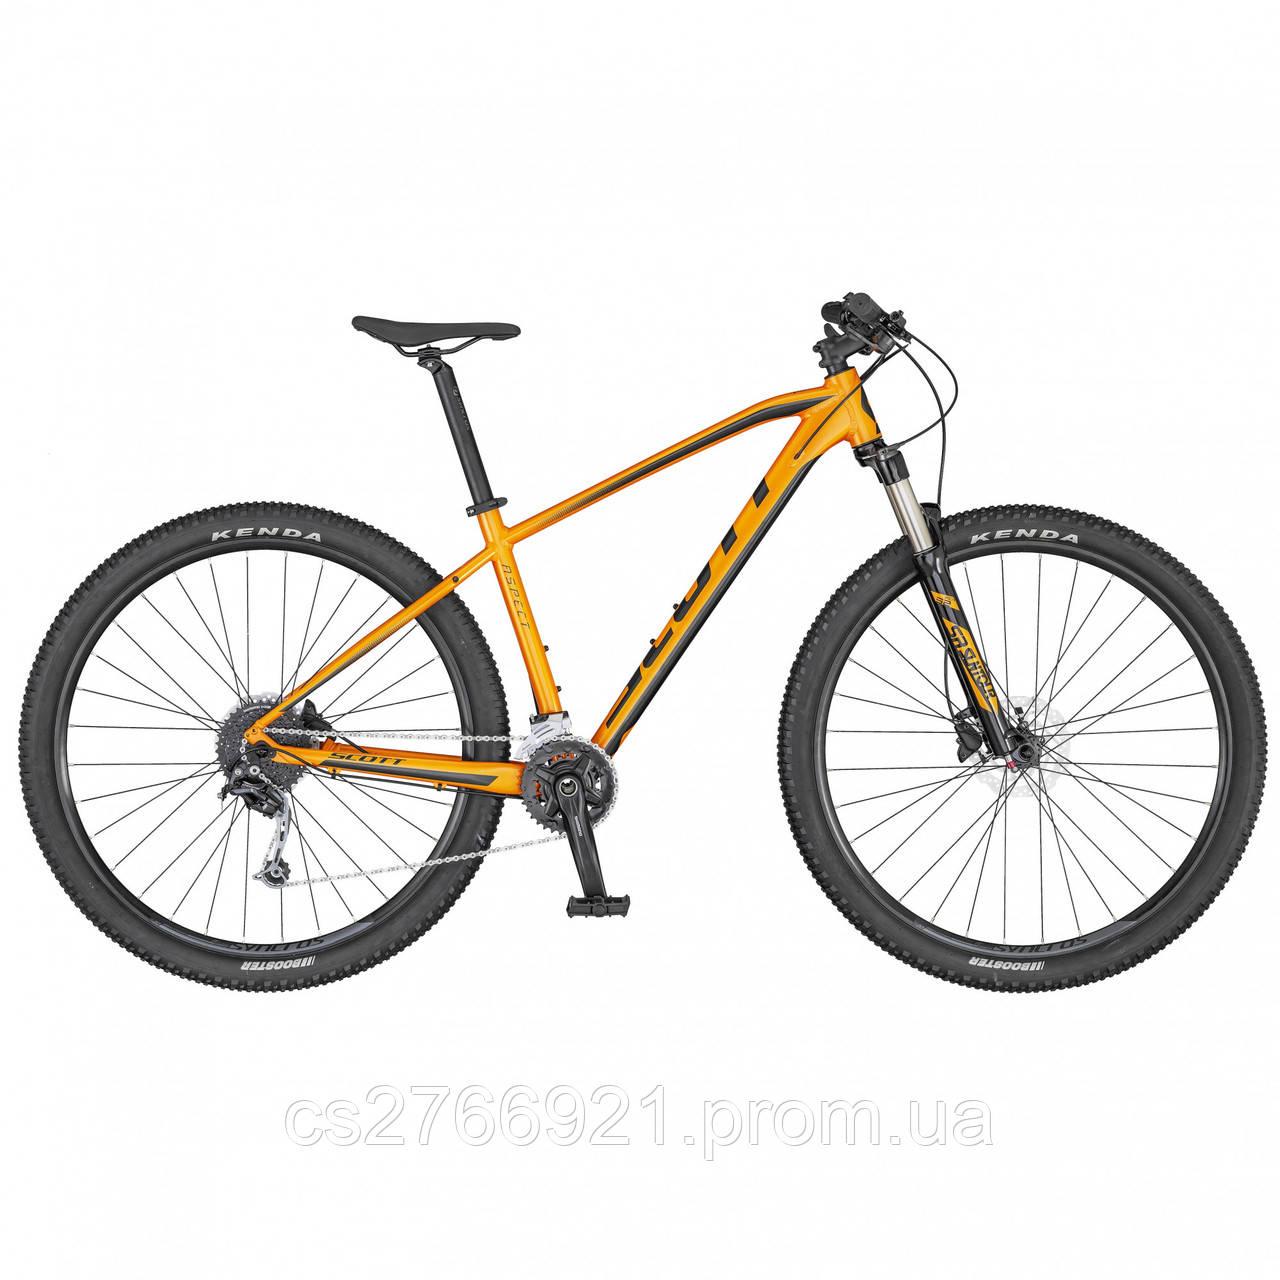 Велосипед ASPECT 940 оранжево/серый (KH) 20 SCOTT